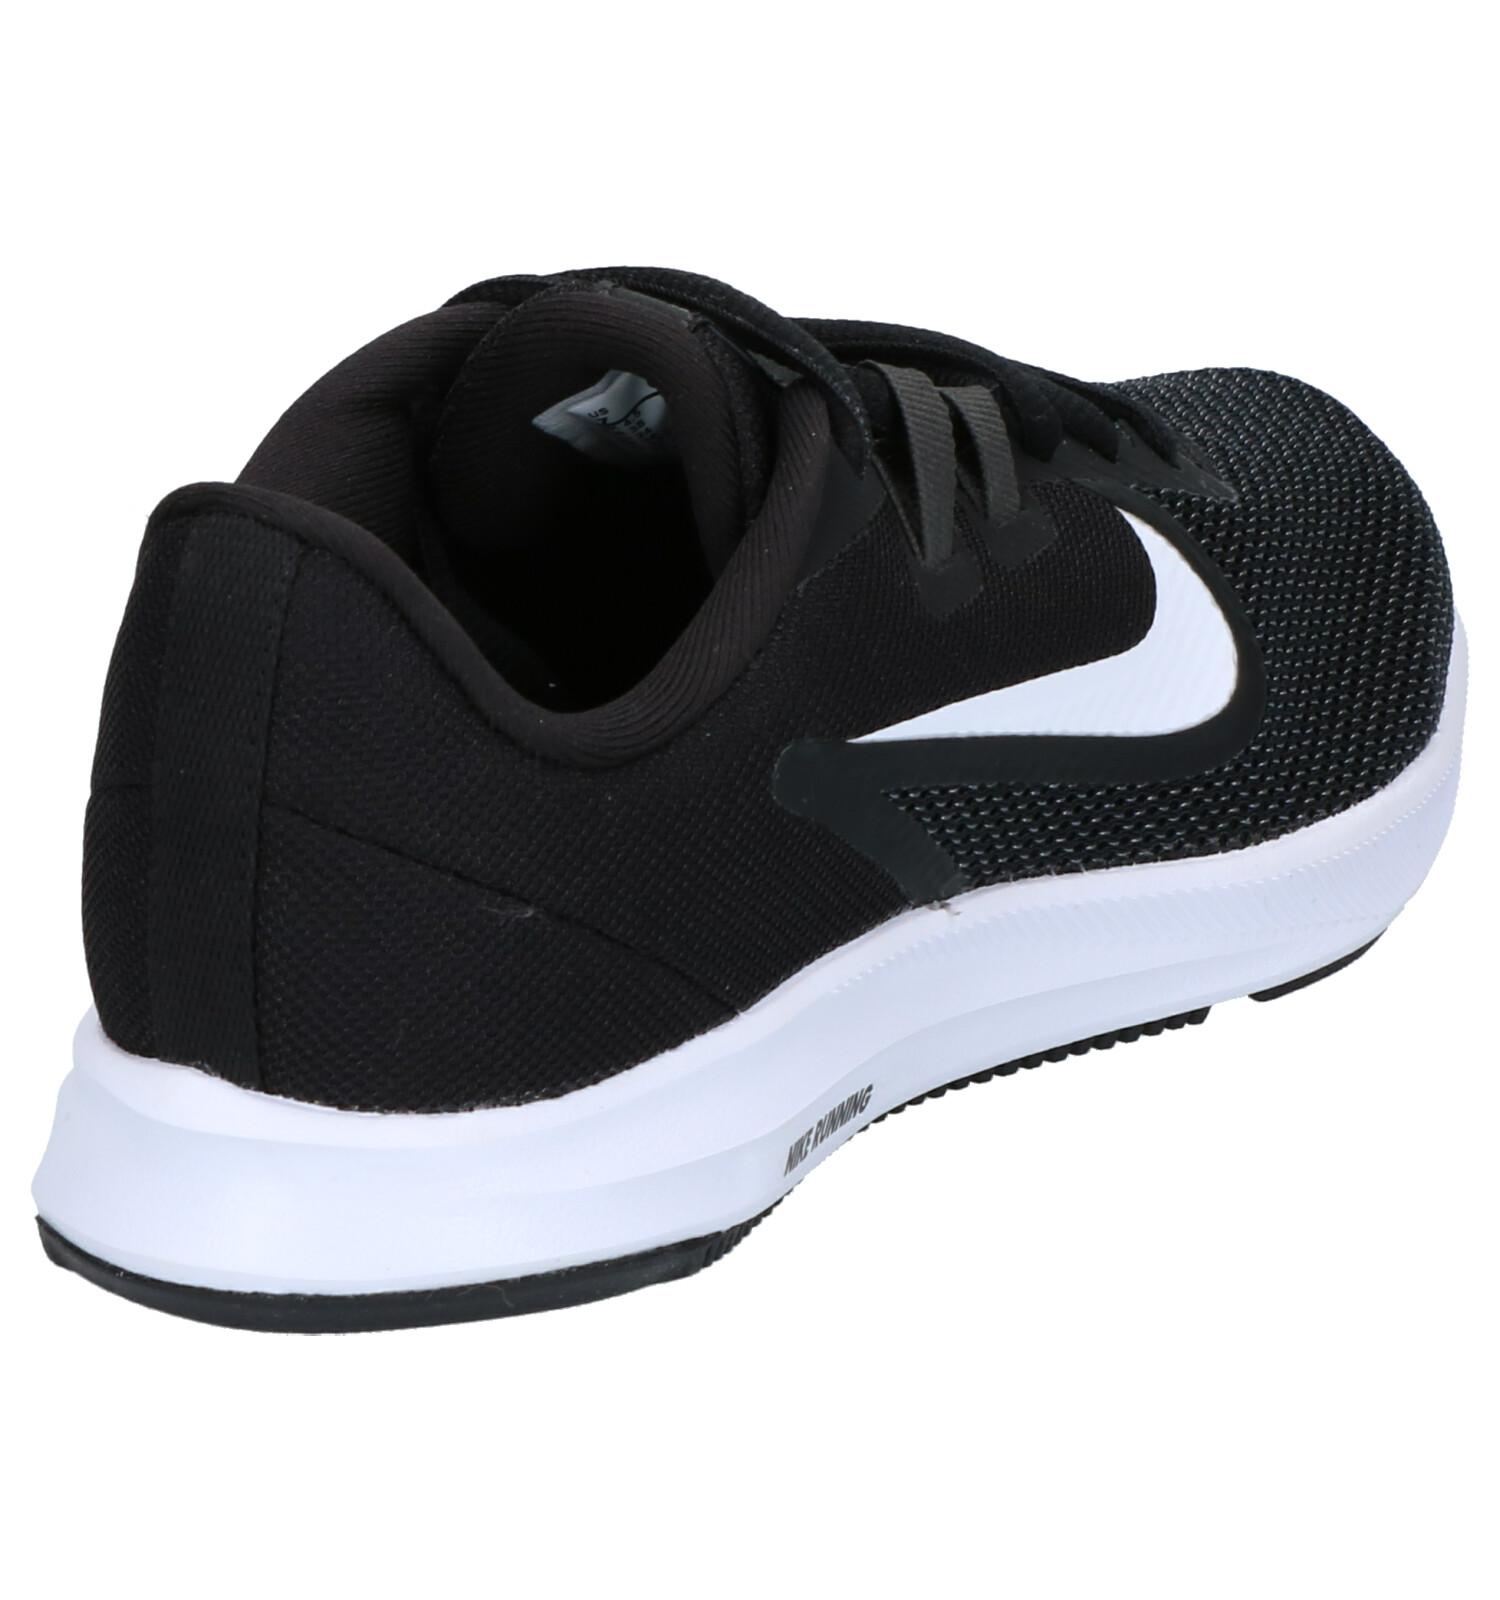 Livraison Nike 9 Downshifter Et Baskets be NoirTorfs En Retour byv6gY7If